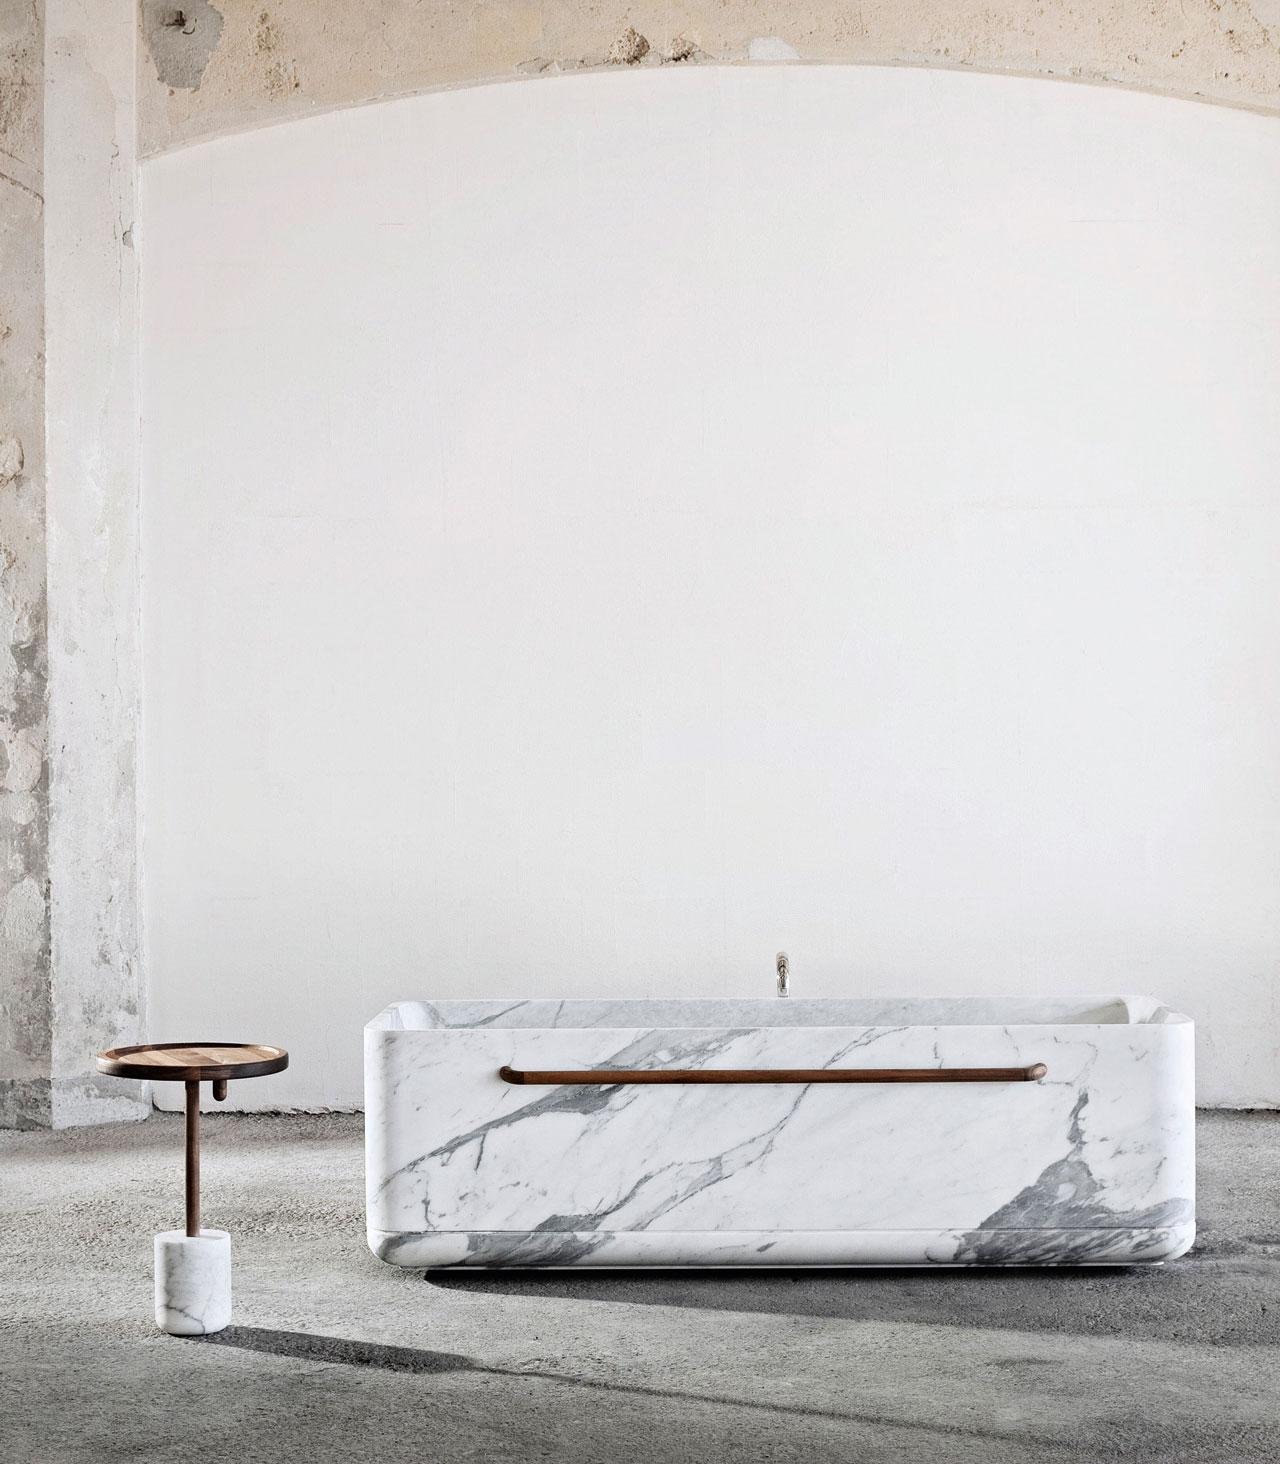 Tavolino side table and Vaska bath tub by Lorenzo Damiani from the MONOLITHOS series of Luce di Carrara.